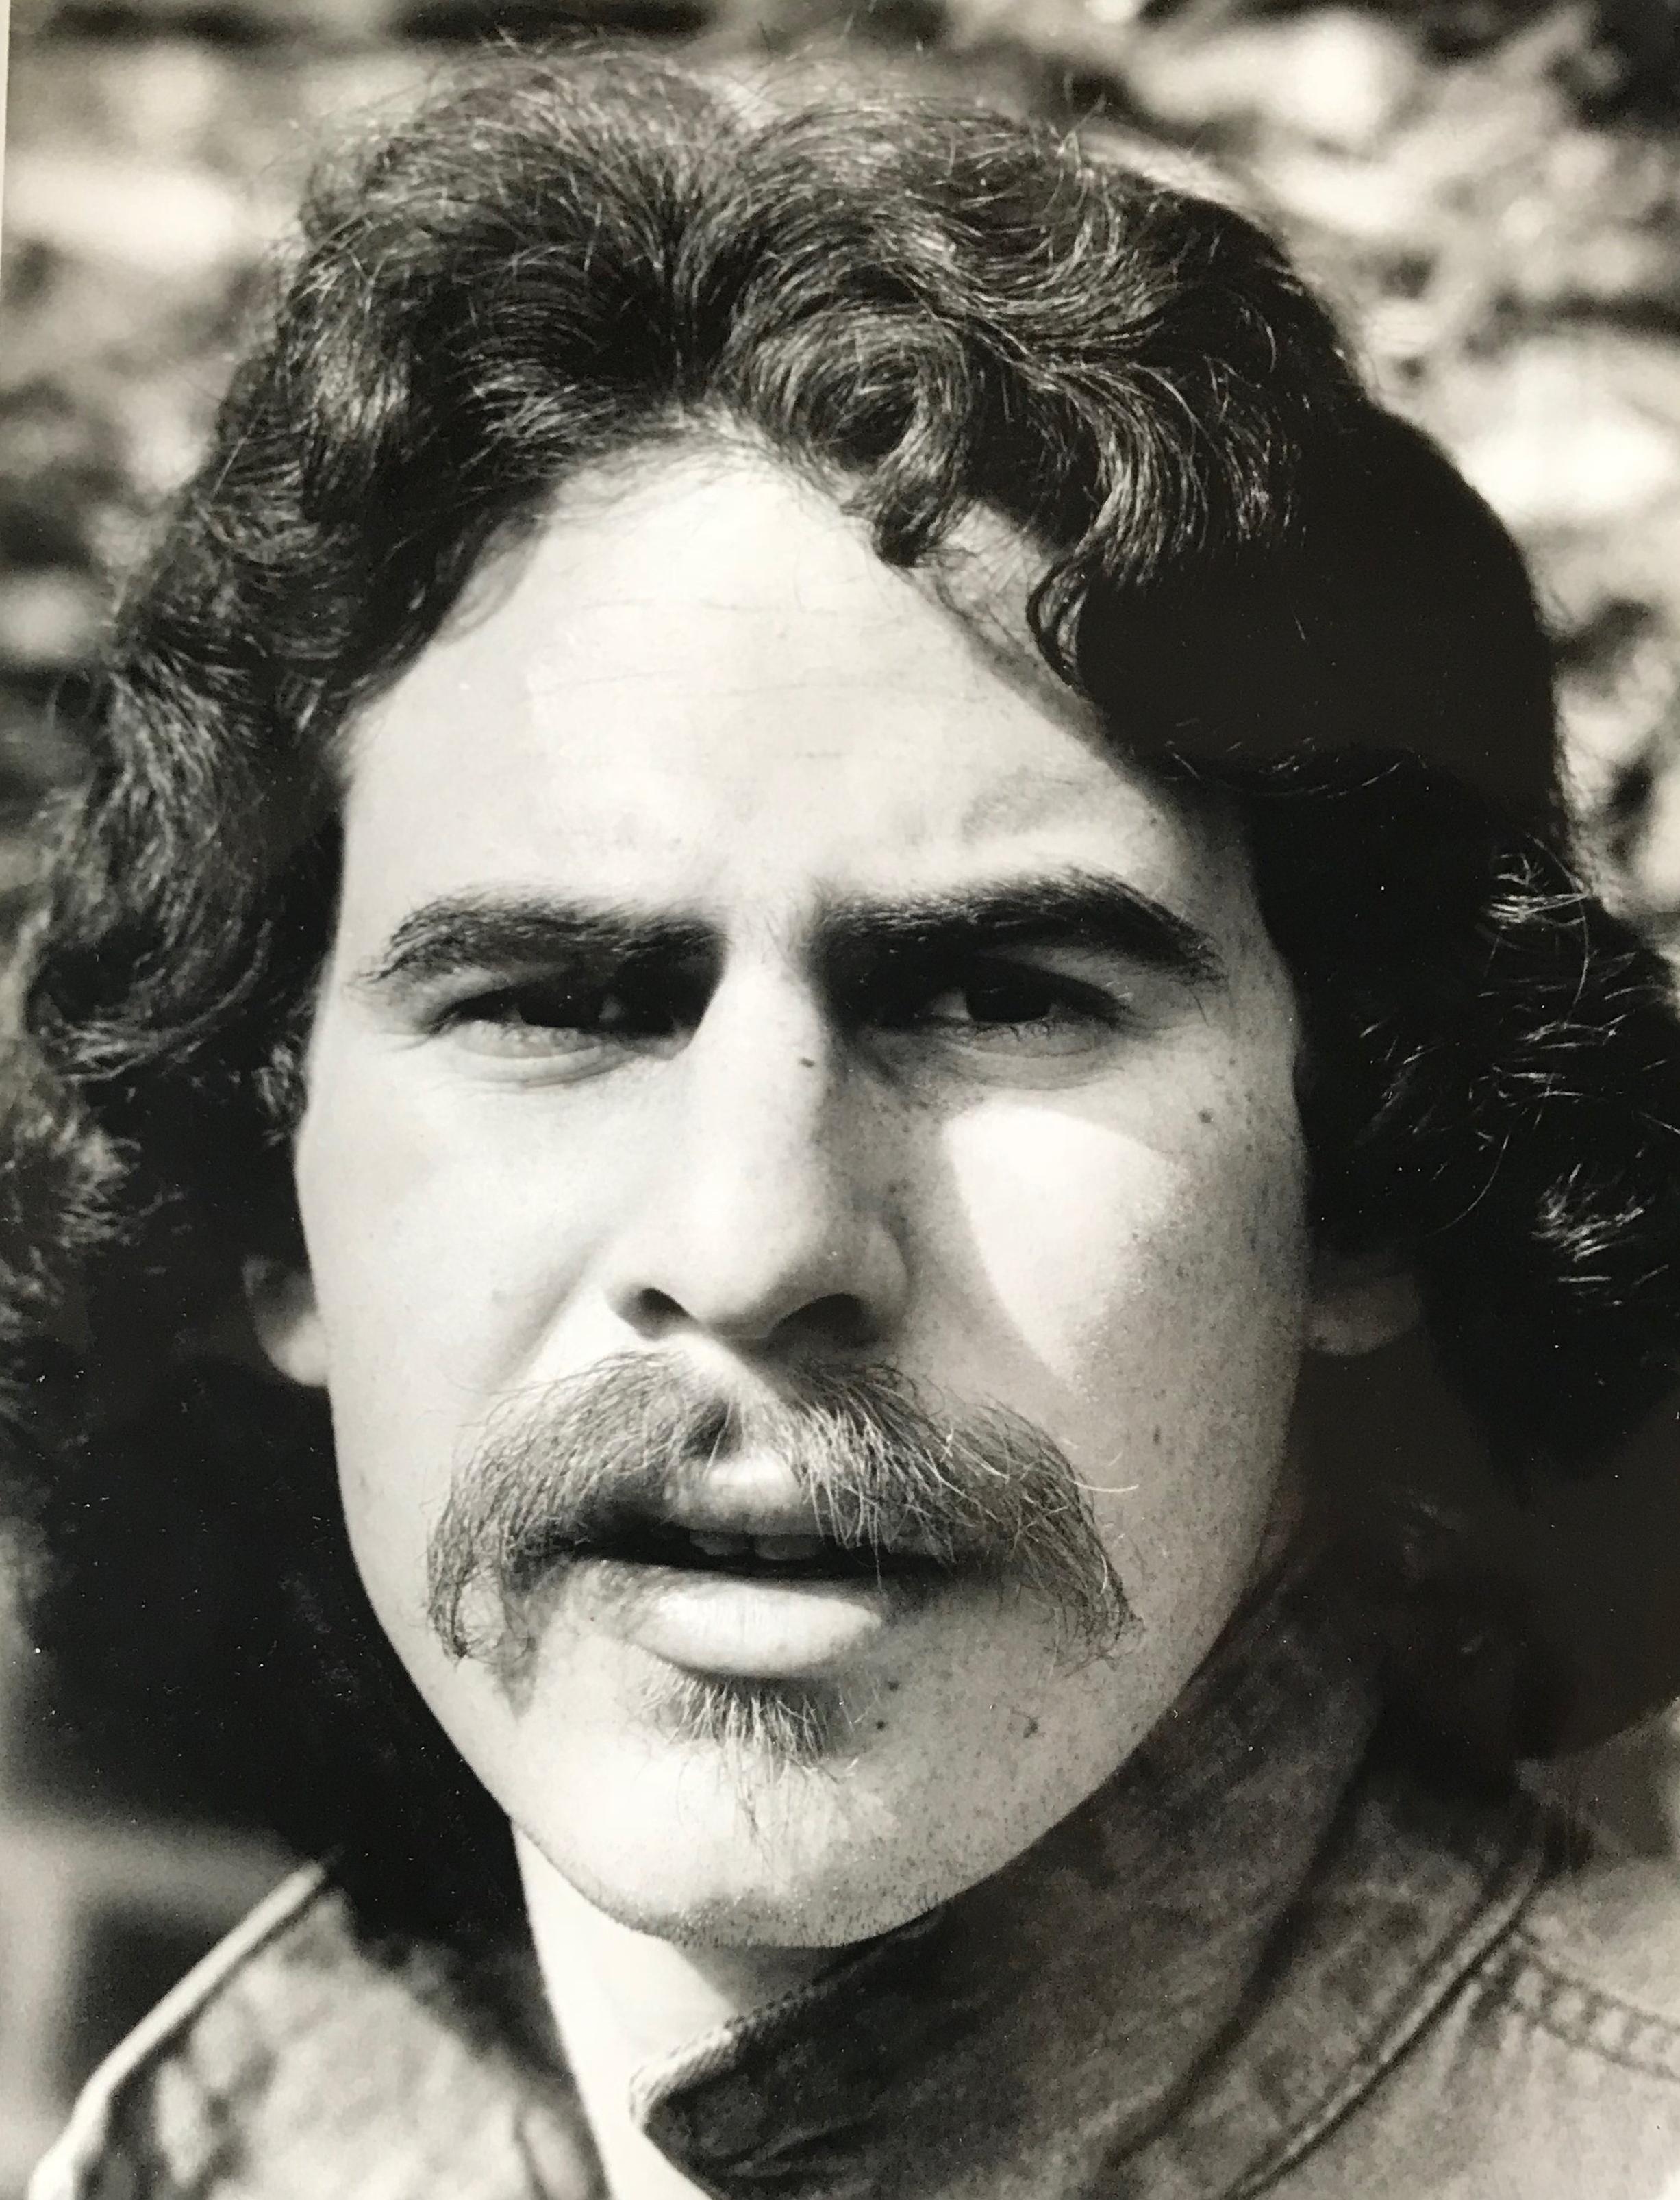 Mark Levine, 1970